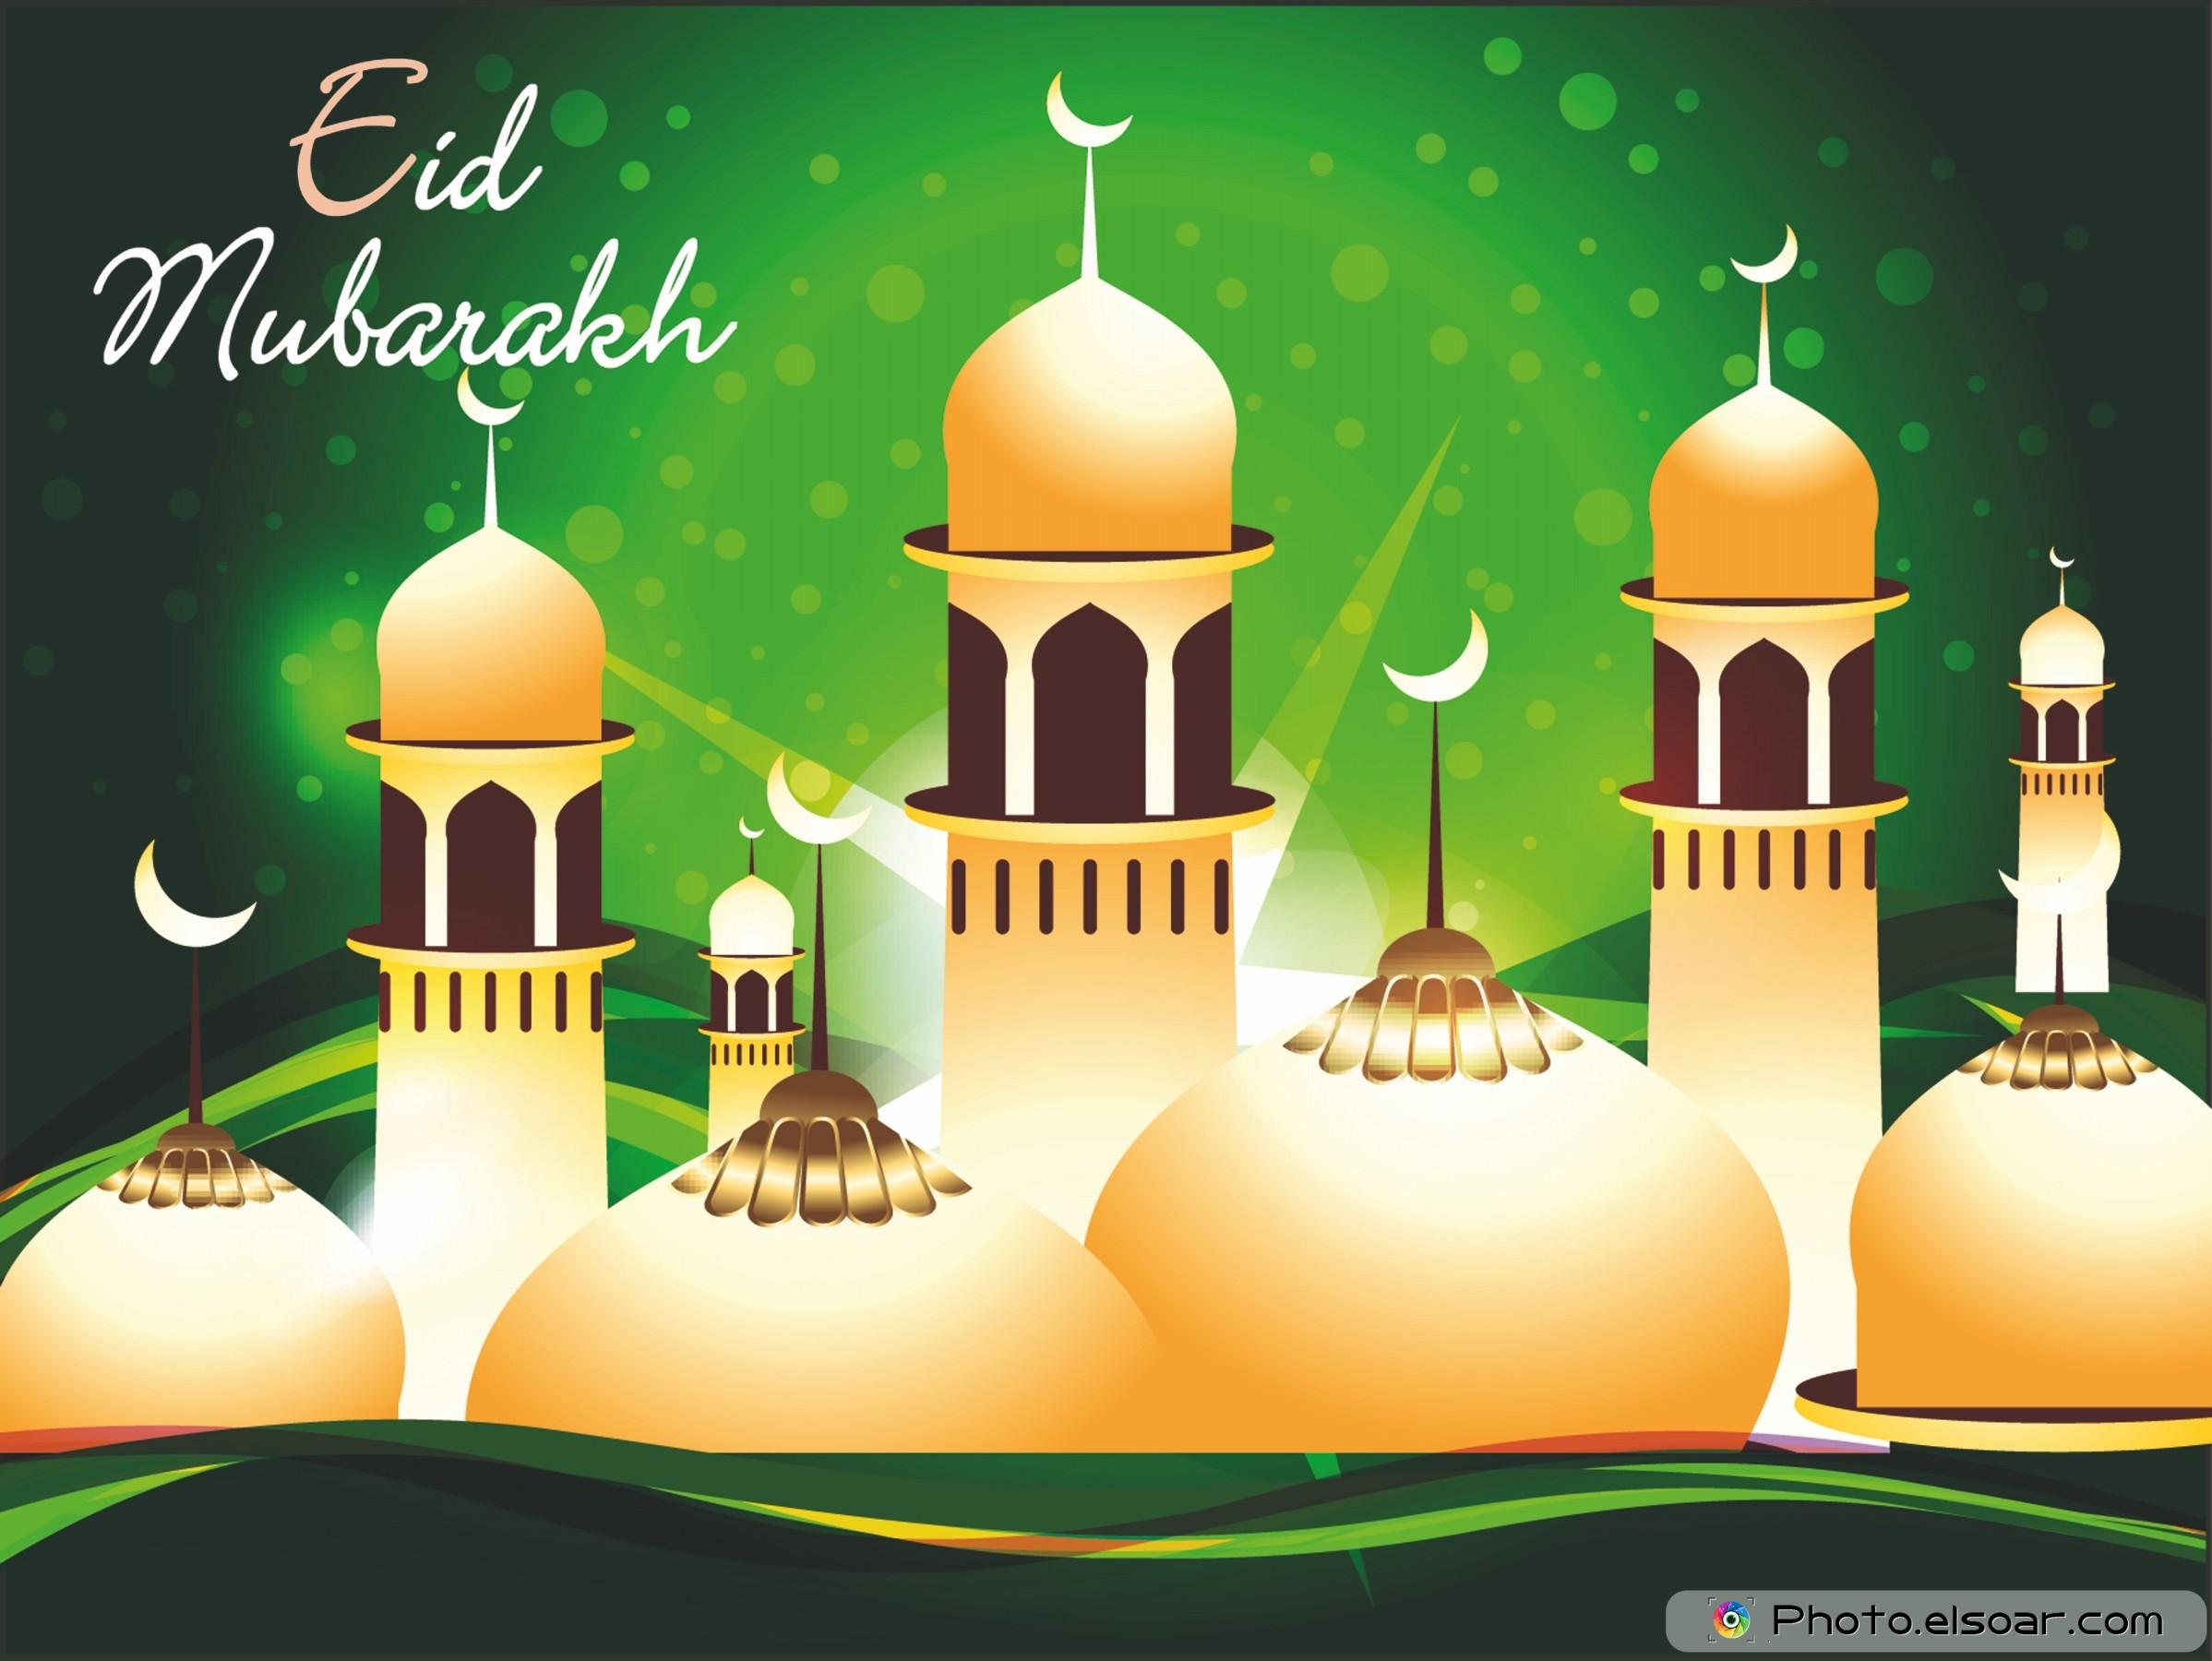 Eid Mubarak Free Hd Wallpaper Download Wallpaper Eid Mubarak 2397x1800 Download Hd Wallpaper Wallpapertip